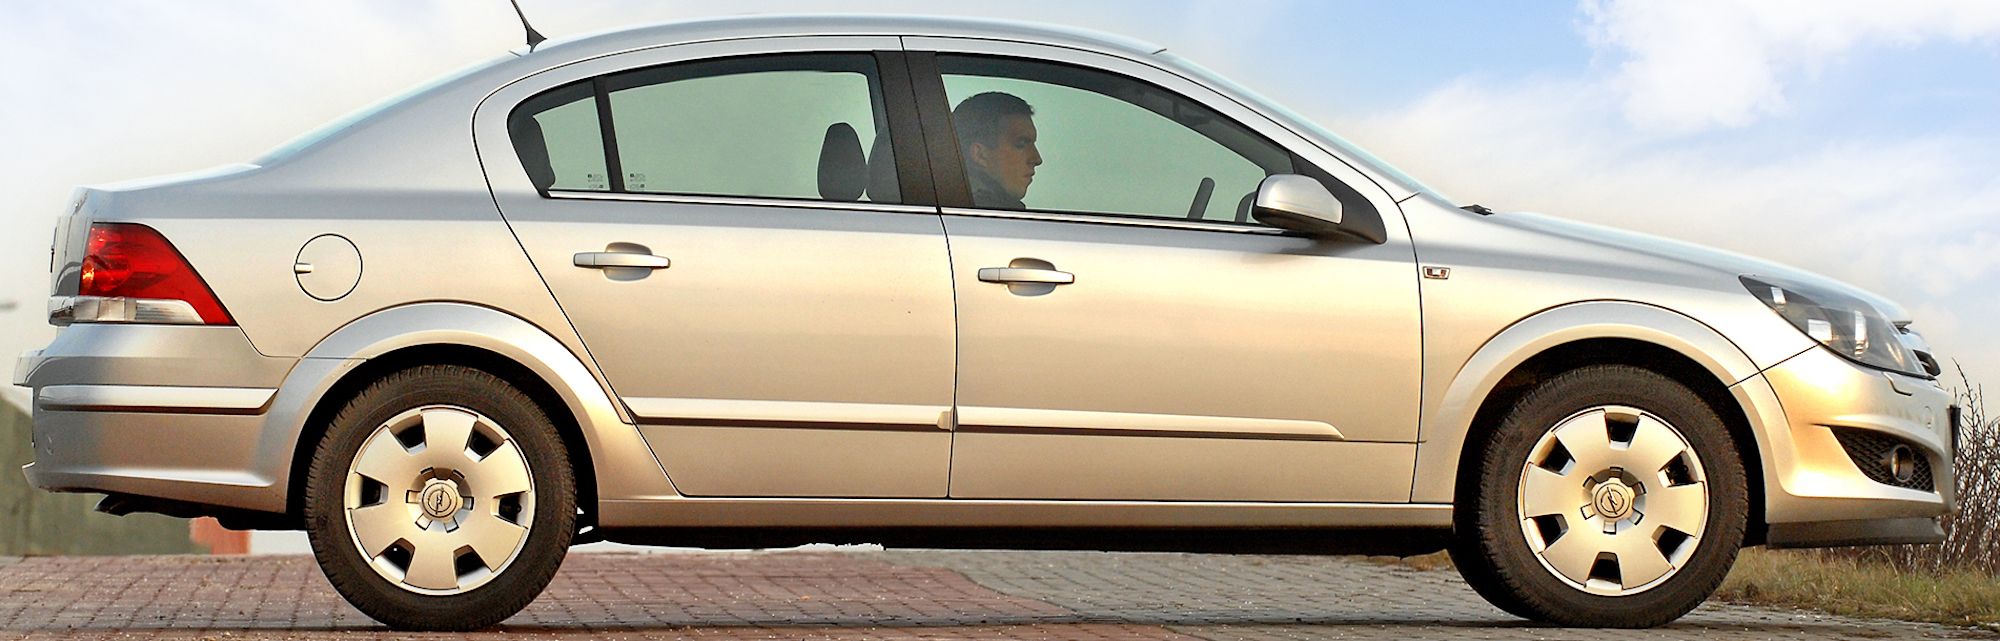 Opel Astra H (2004-2014)